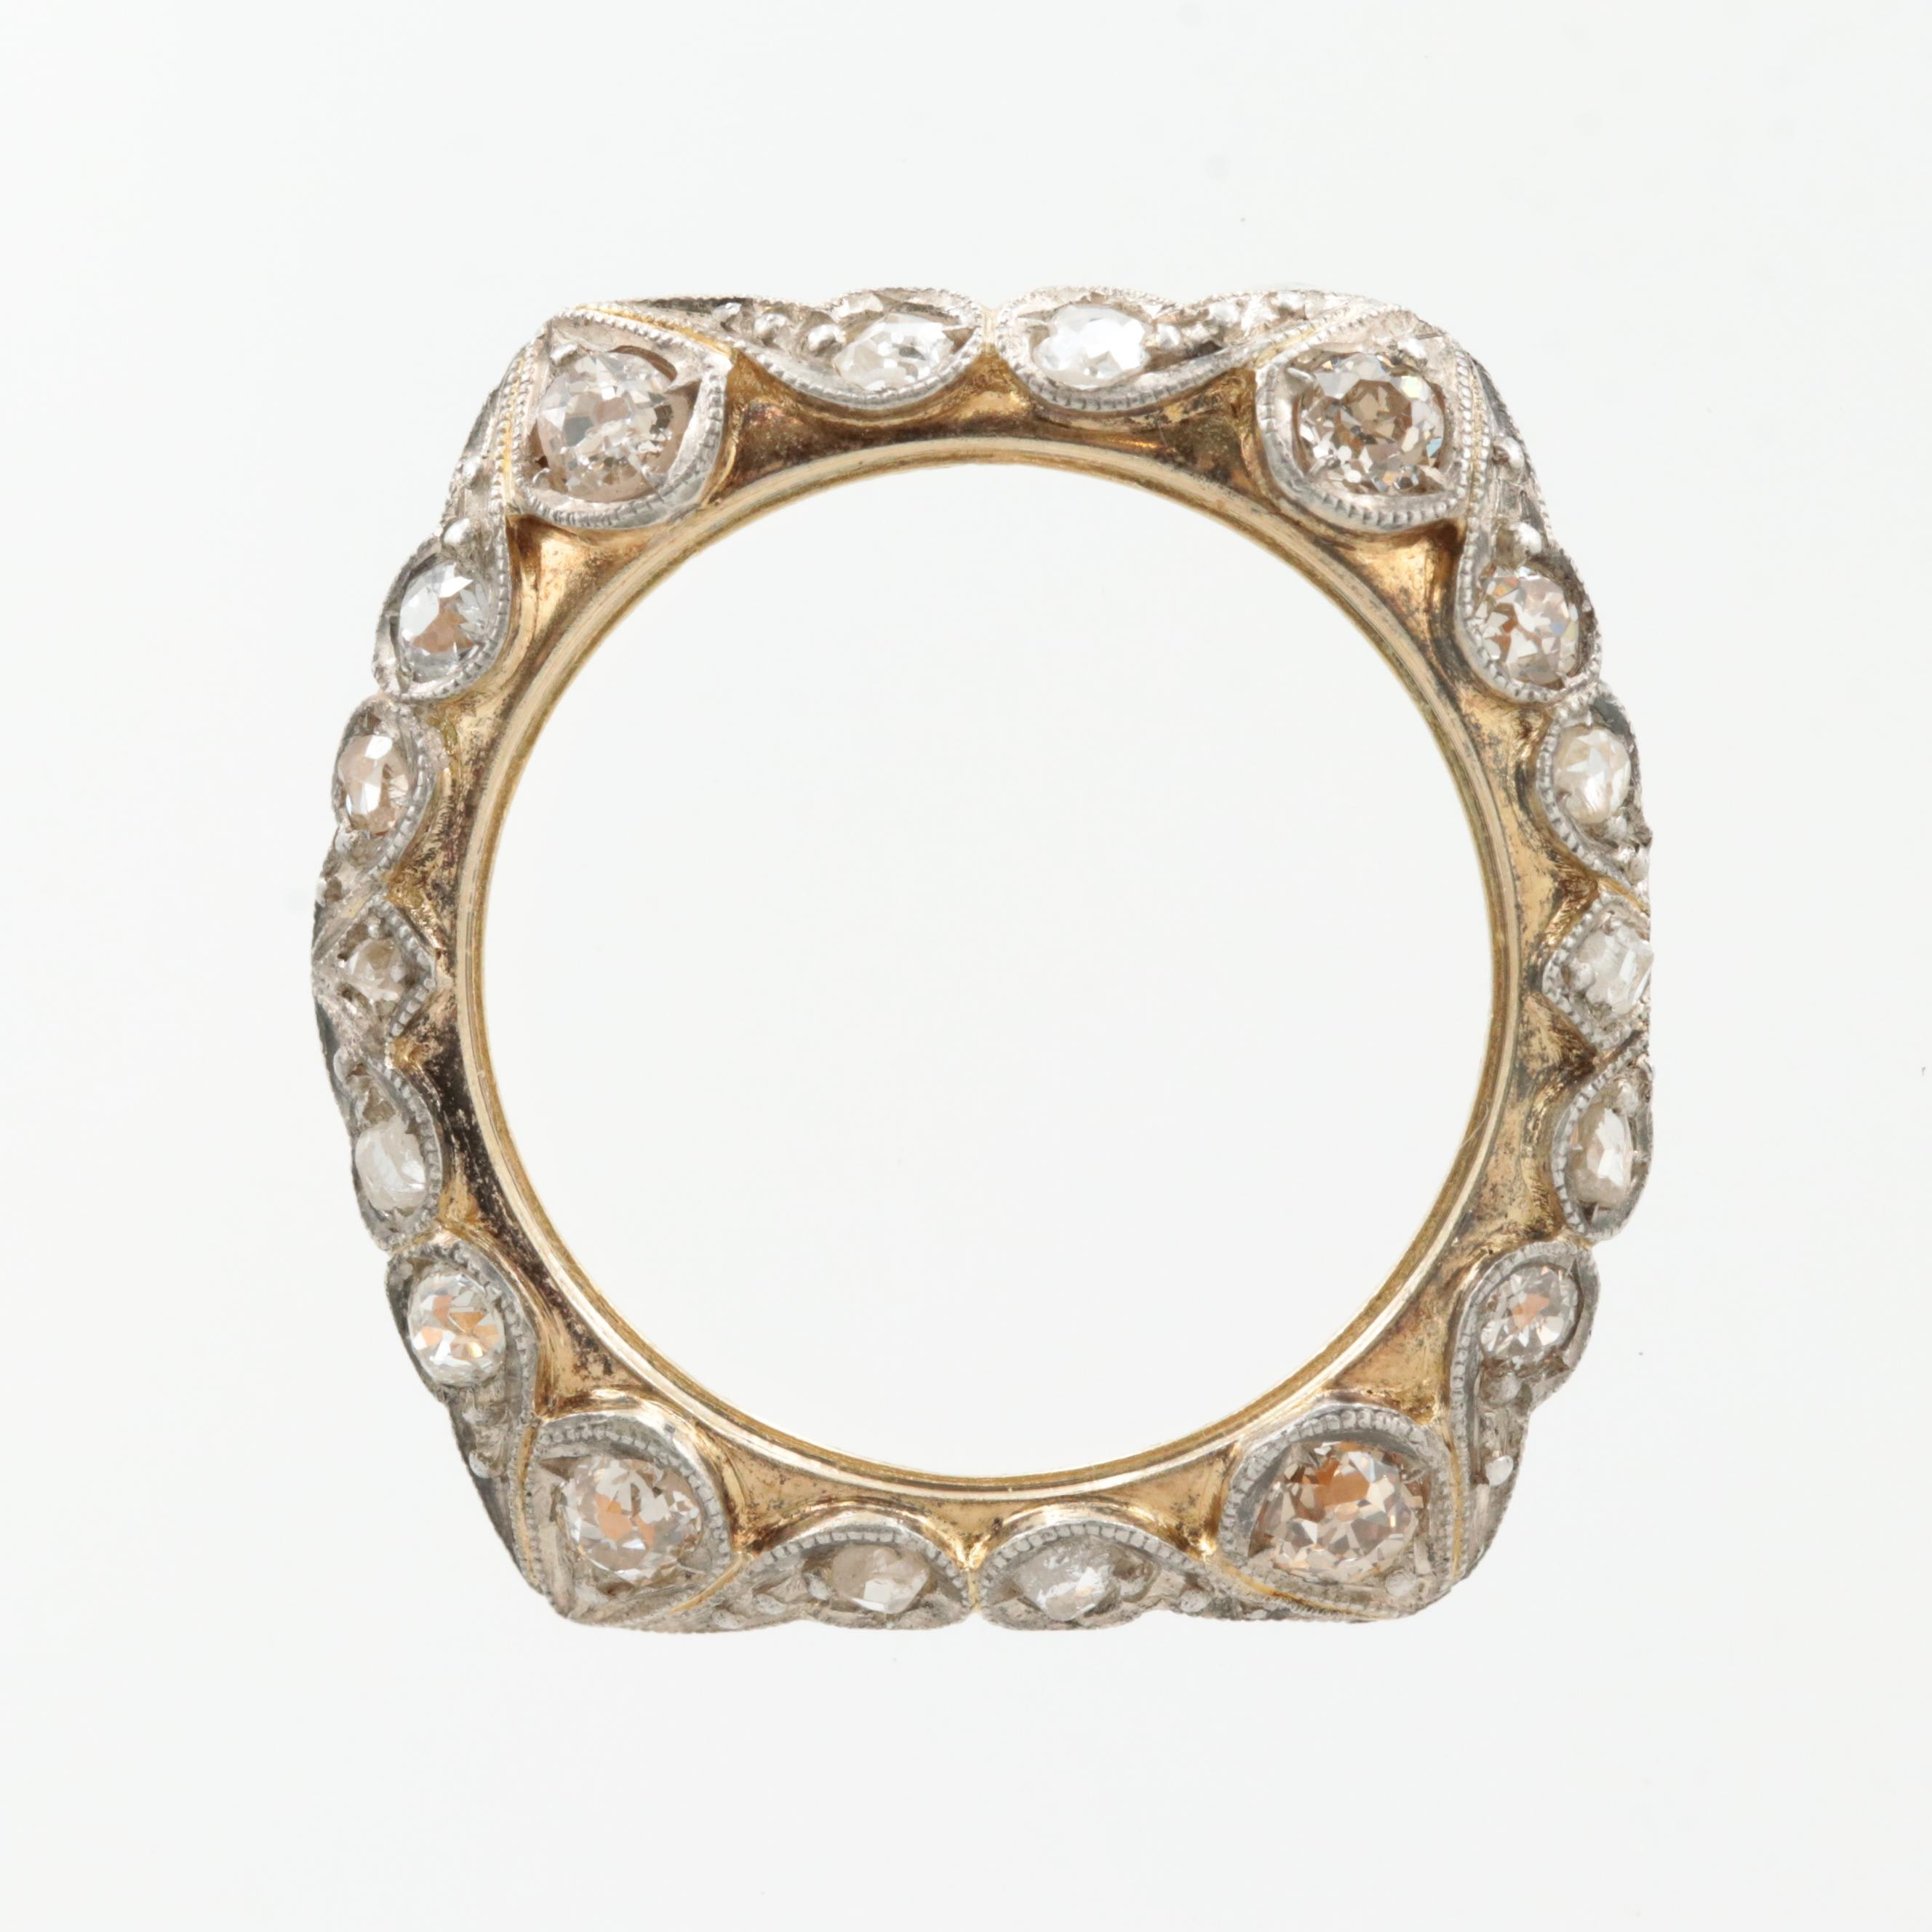 14K Yellow Gold and Sterling Silver Diamond Watch Bezel